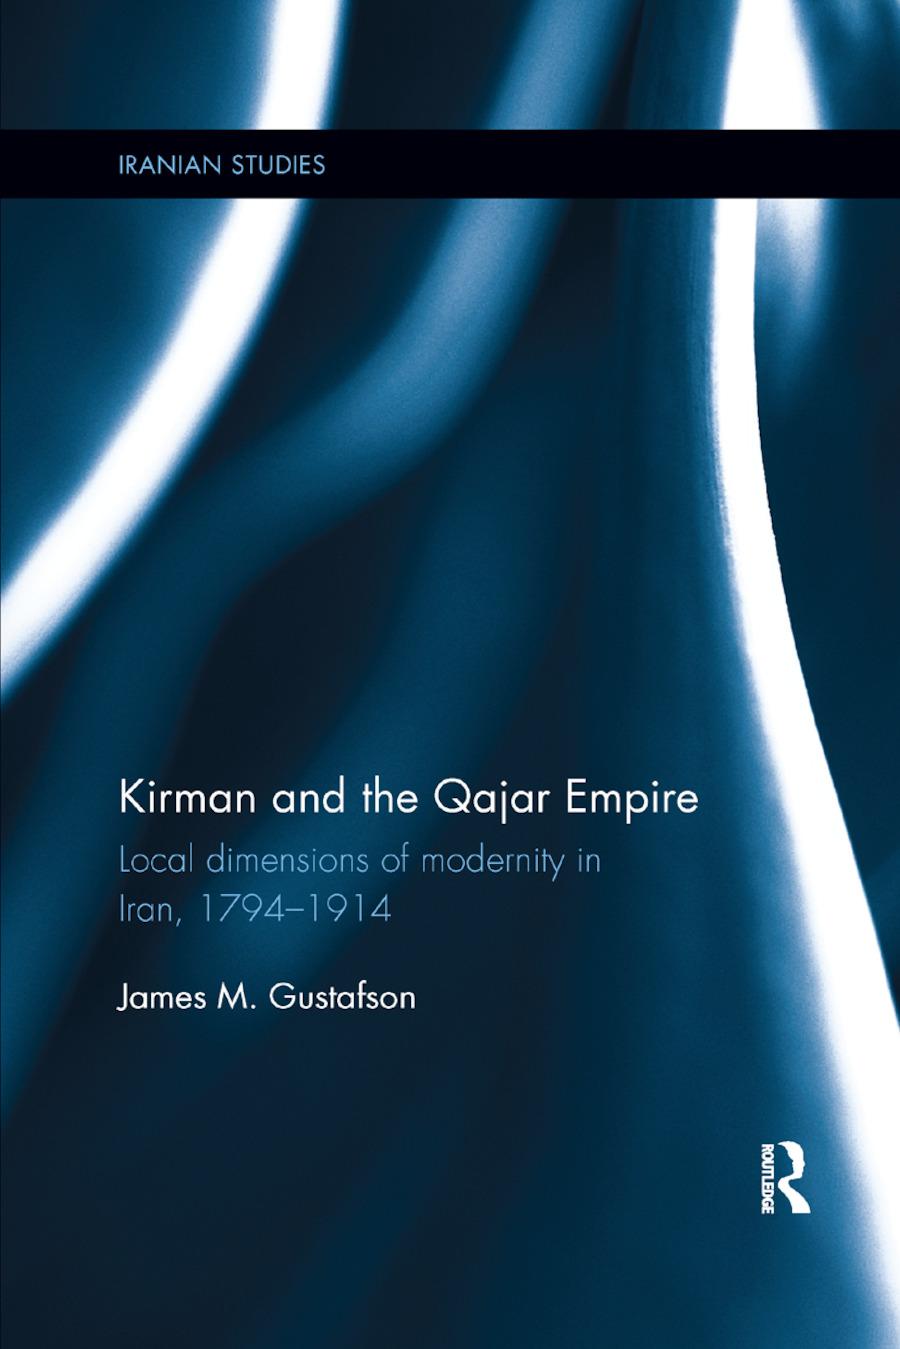 Kirman and the Qajar Empire